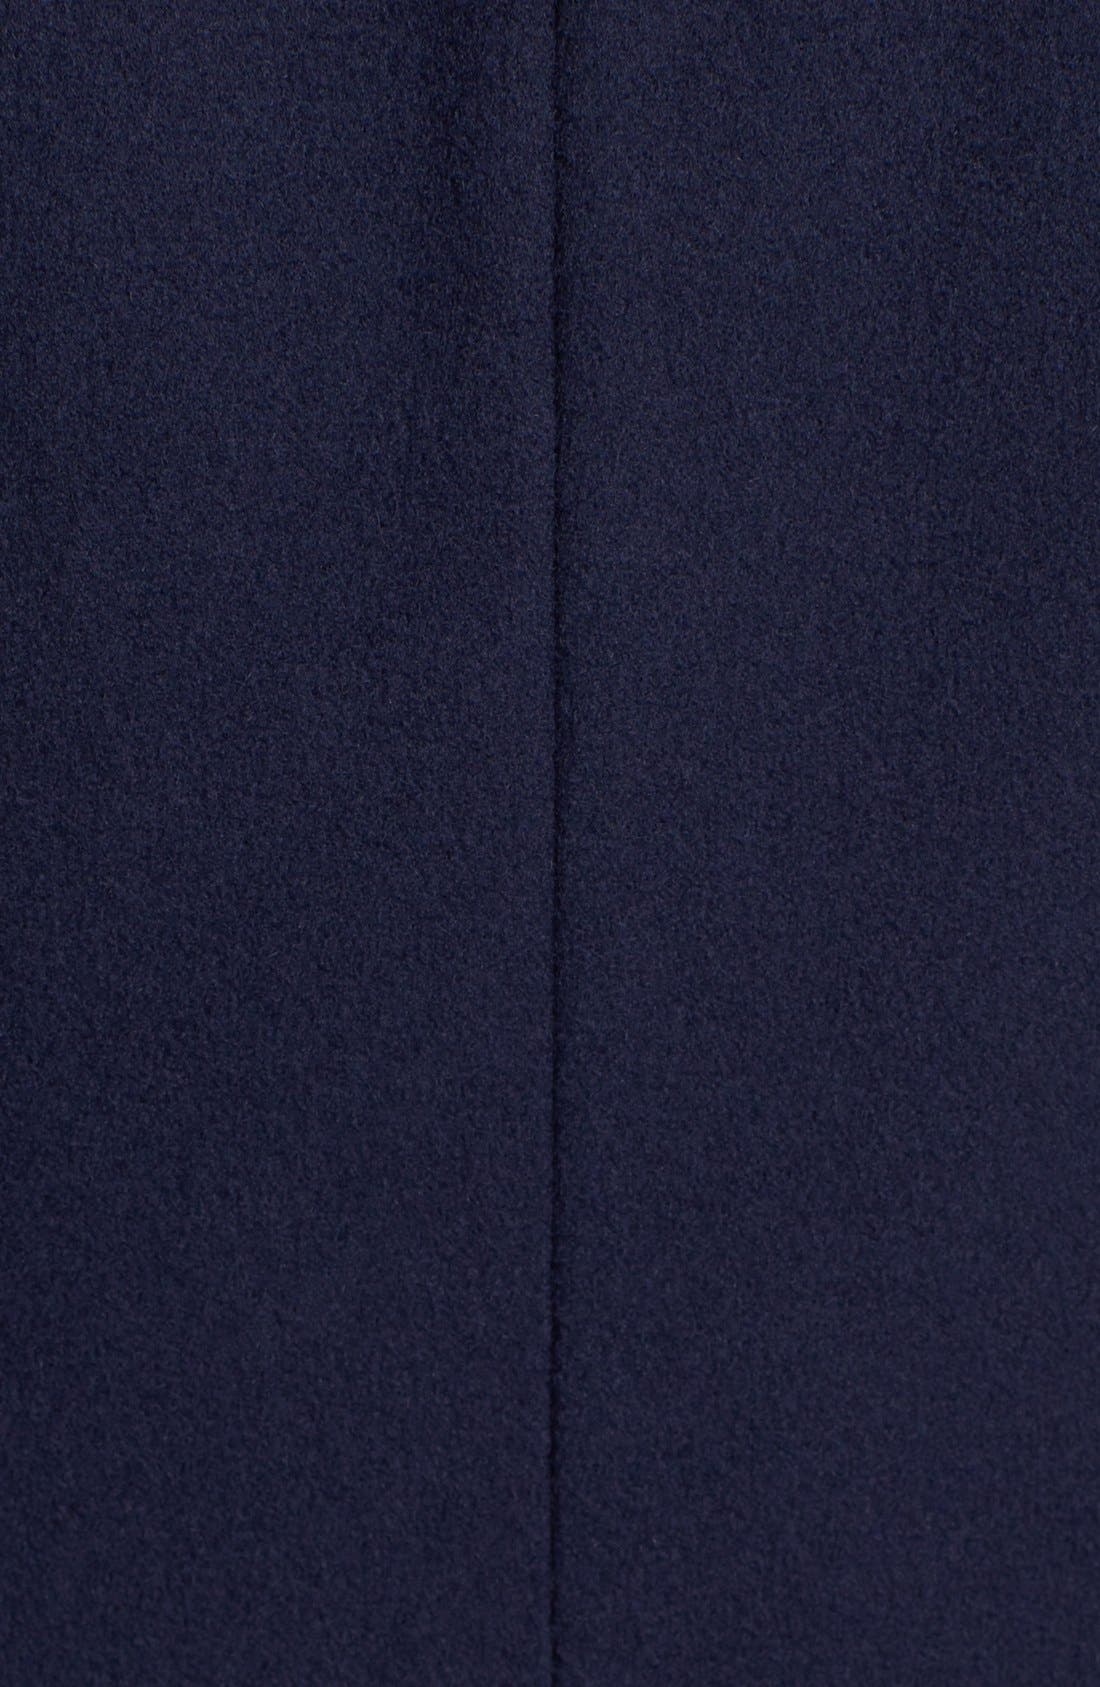 Alternate Image 3  - Trina Turk Lambswool & Cashmere Officer's Coat (Petite)